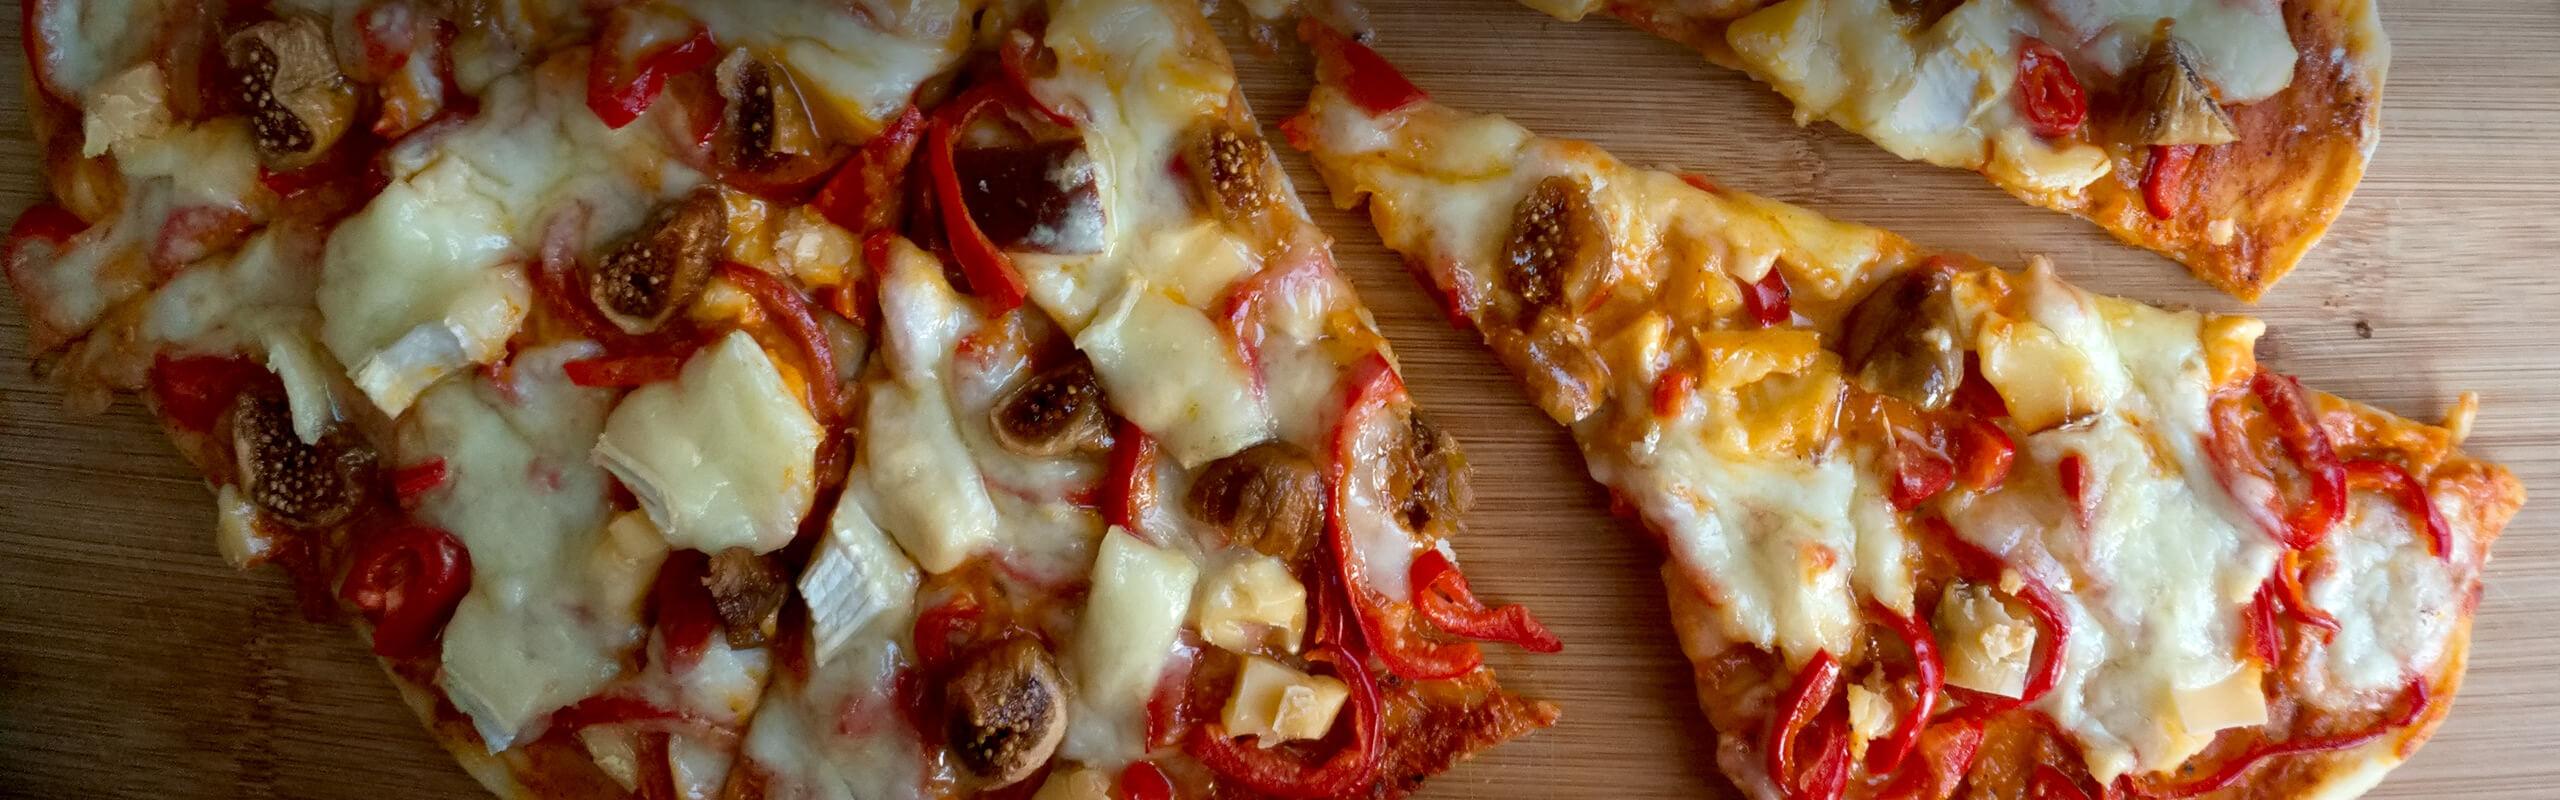 Домашна пица 'Три сирена'